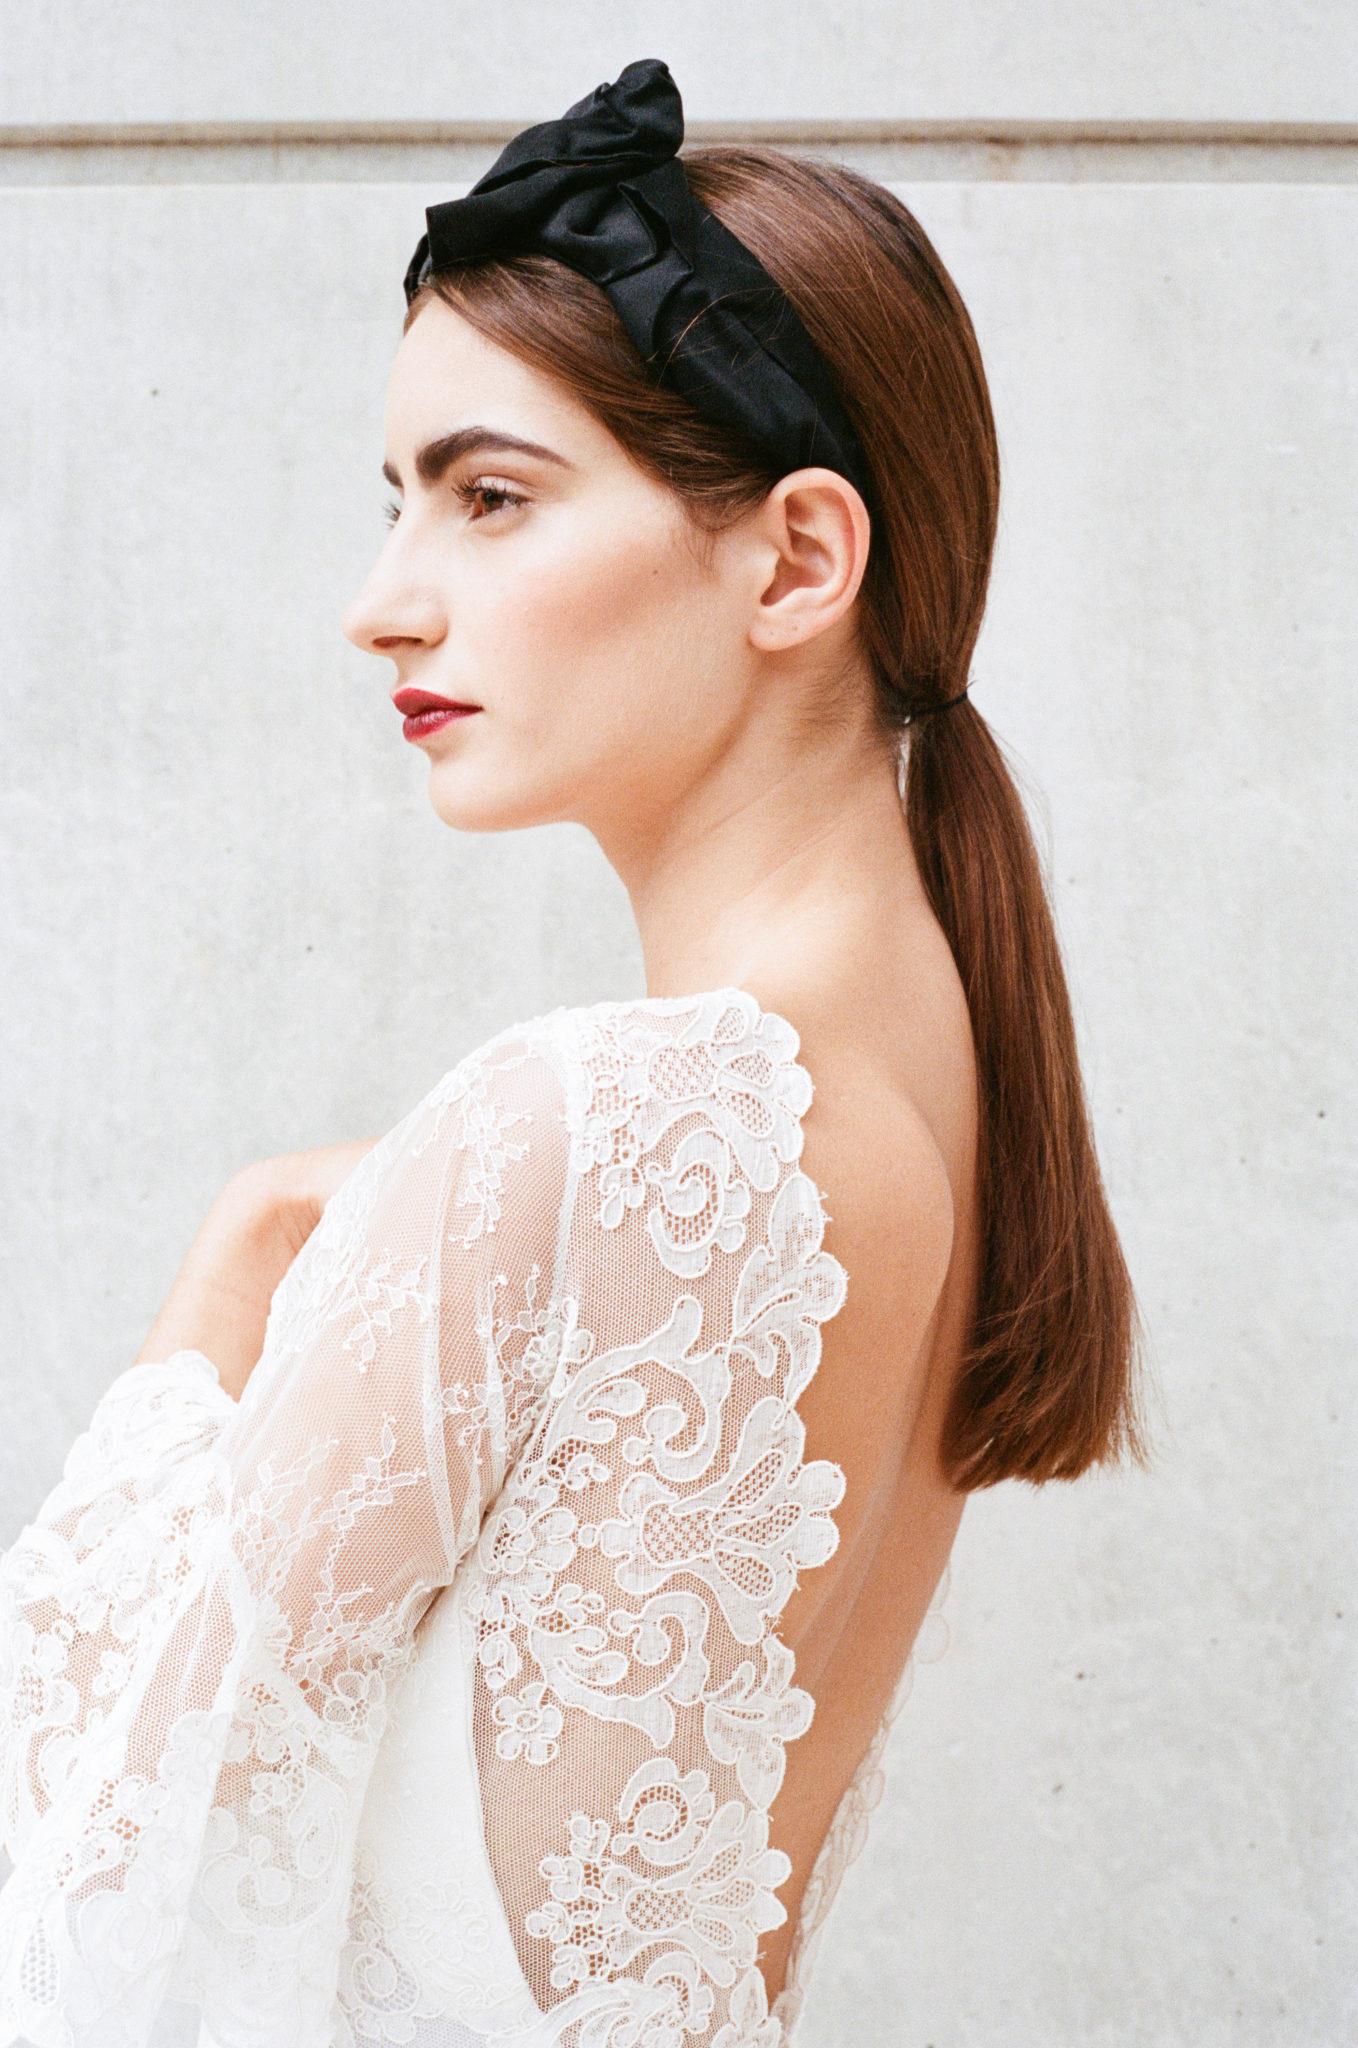 Le Wedding Urban Brides robe Caroline Takvorian bandeau jennifer Behr chez Suzanne Ceremony Presqu'îleCaen